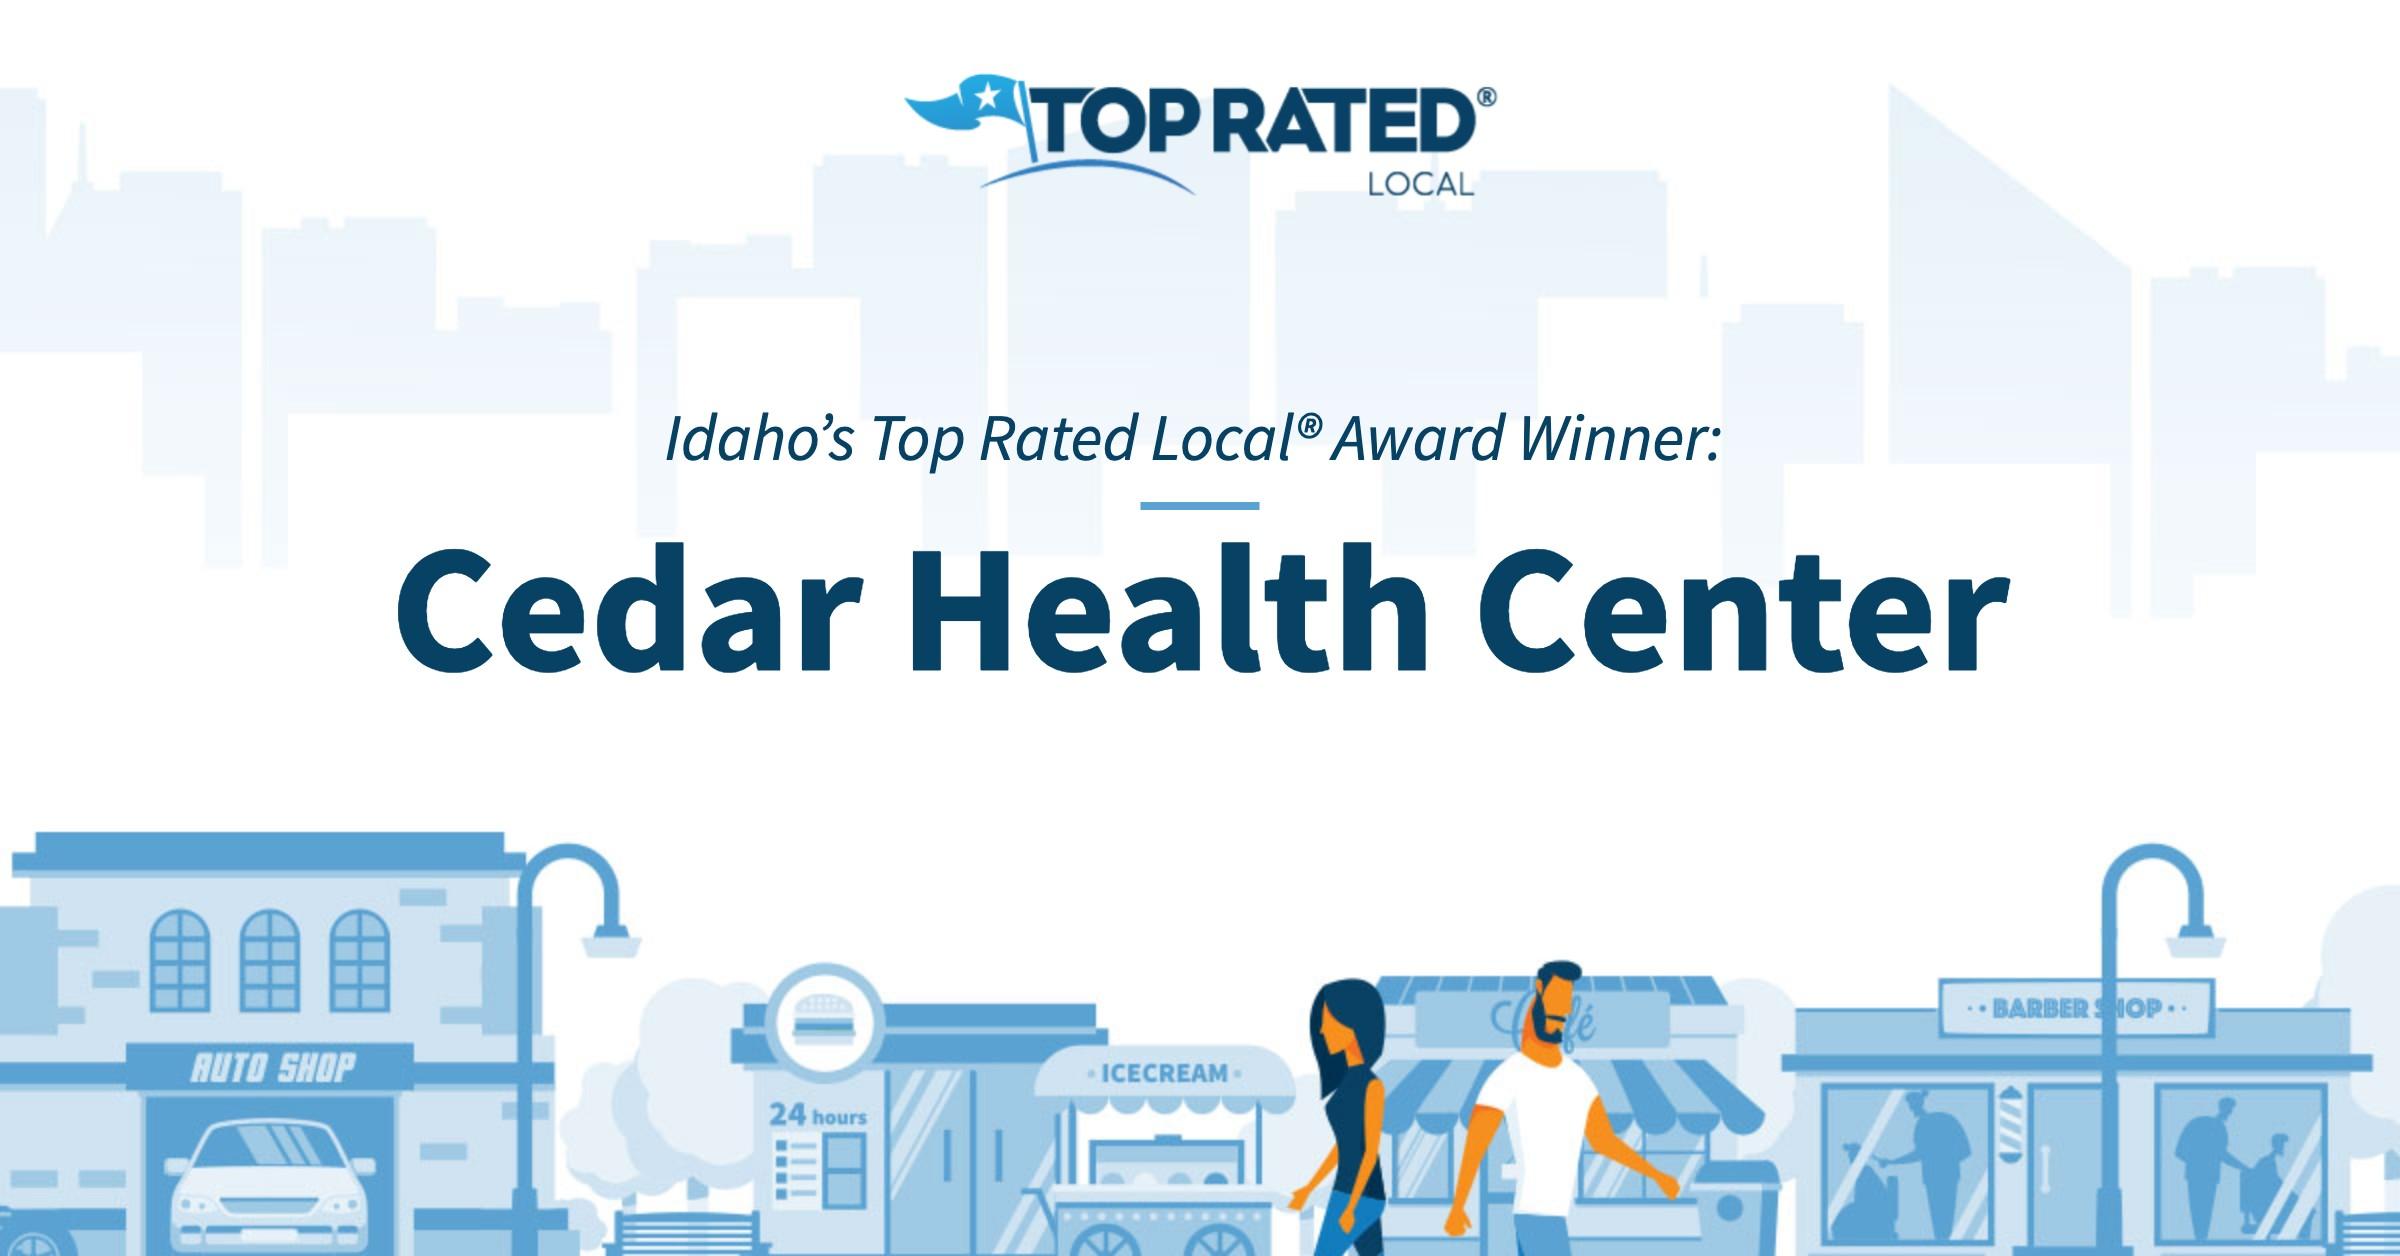 Idaho's Top Rated Local® Award Winner: Cedar Health Center